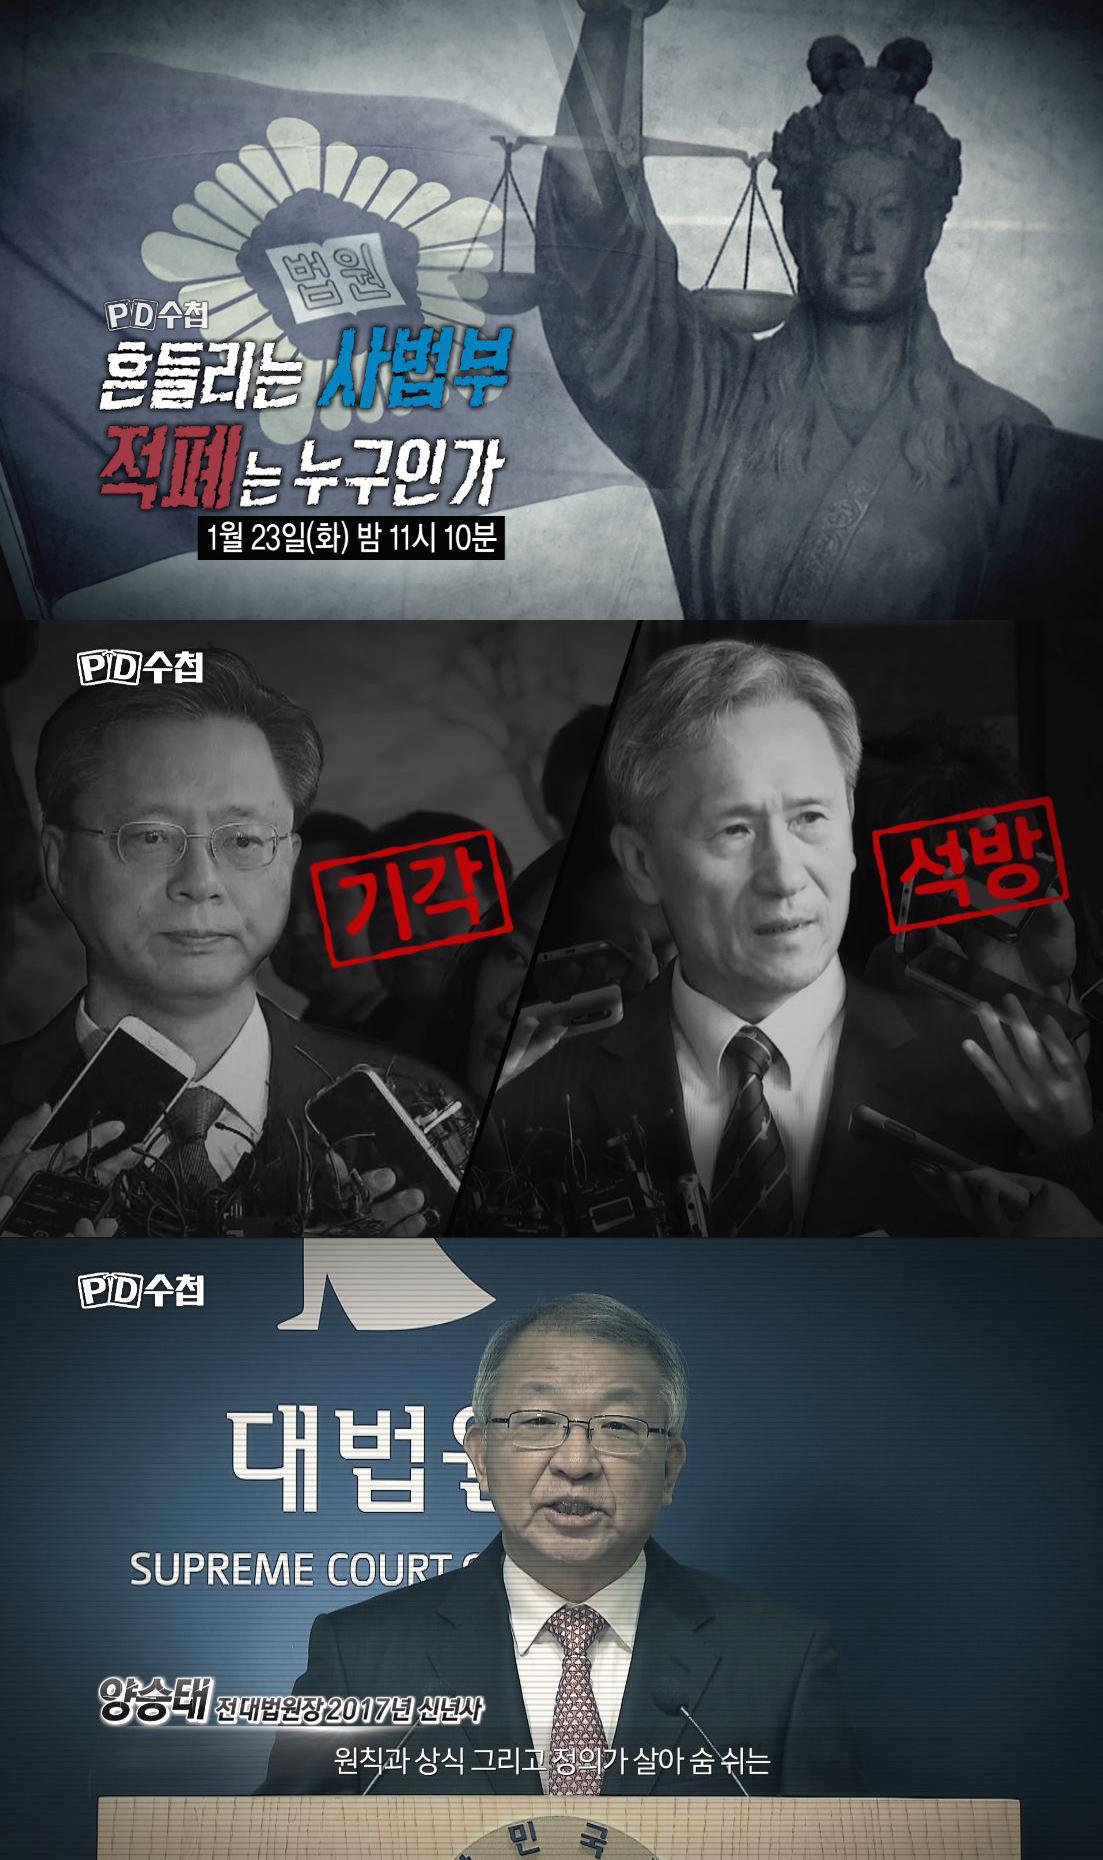 'PD수첩' 사법부 문제 집중 조명… '흔들리는 사법부, 적폐는 누구인가?'